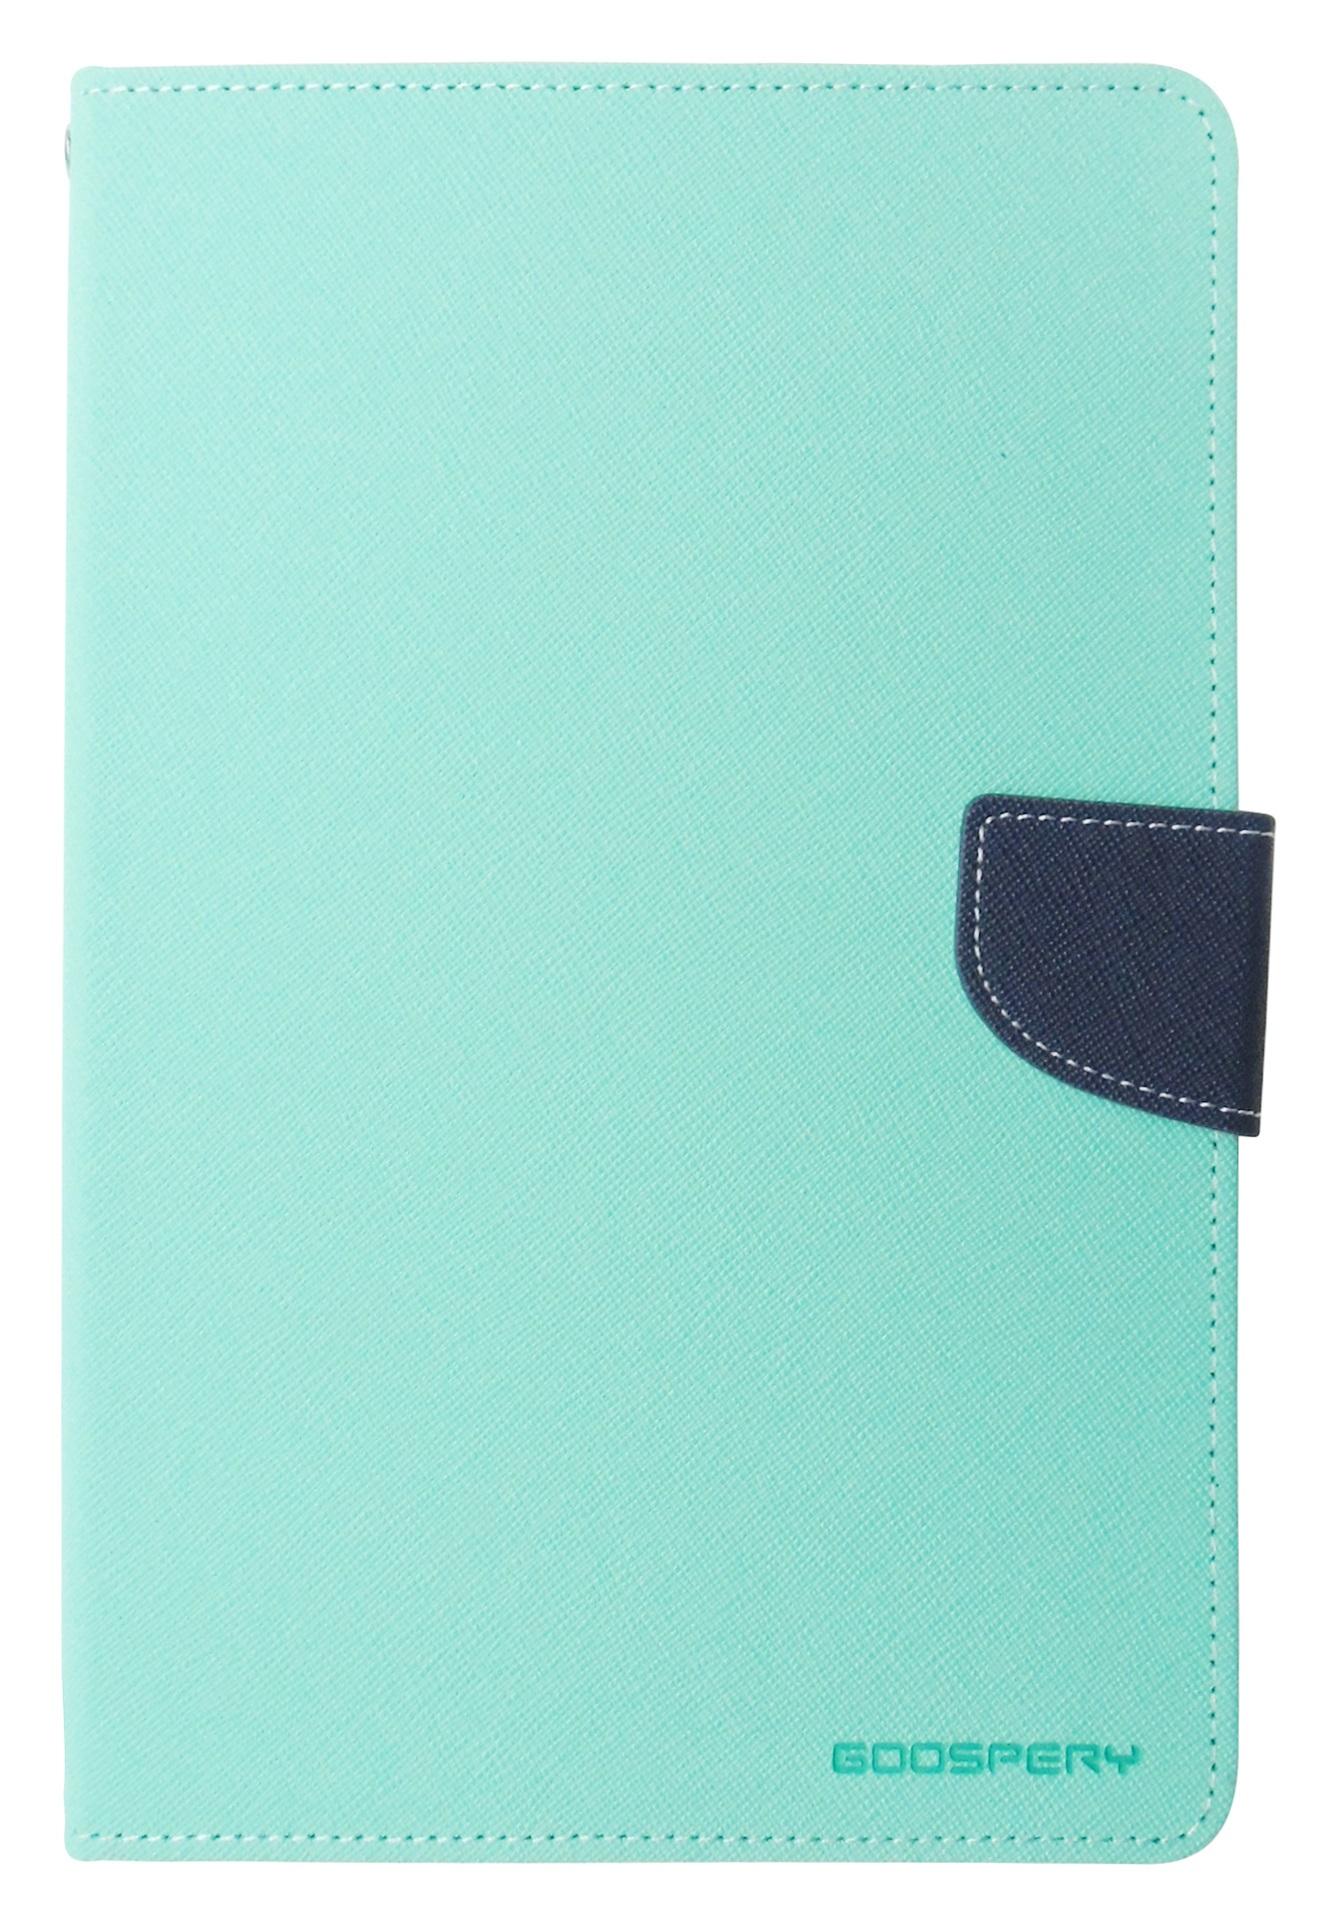 Husa tip carte Mercury Goospery Fancy Diary verde + bleumarin pentru Apple iPad Mini 4